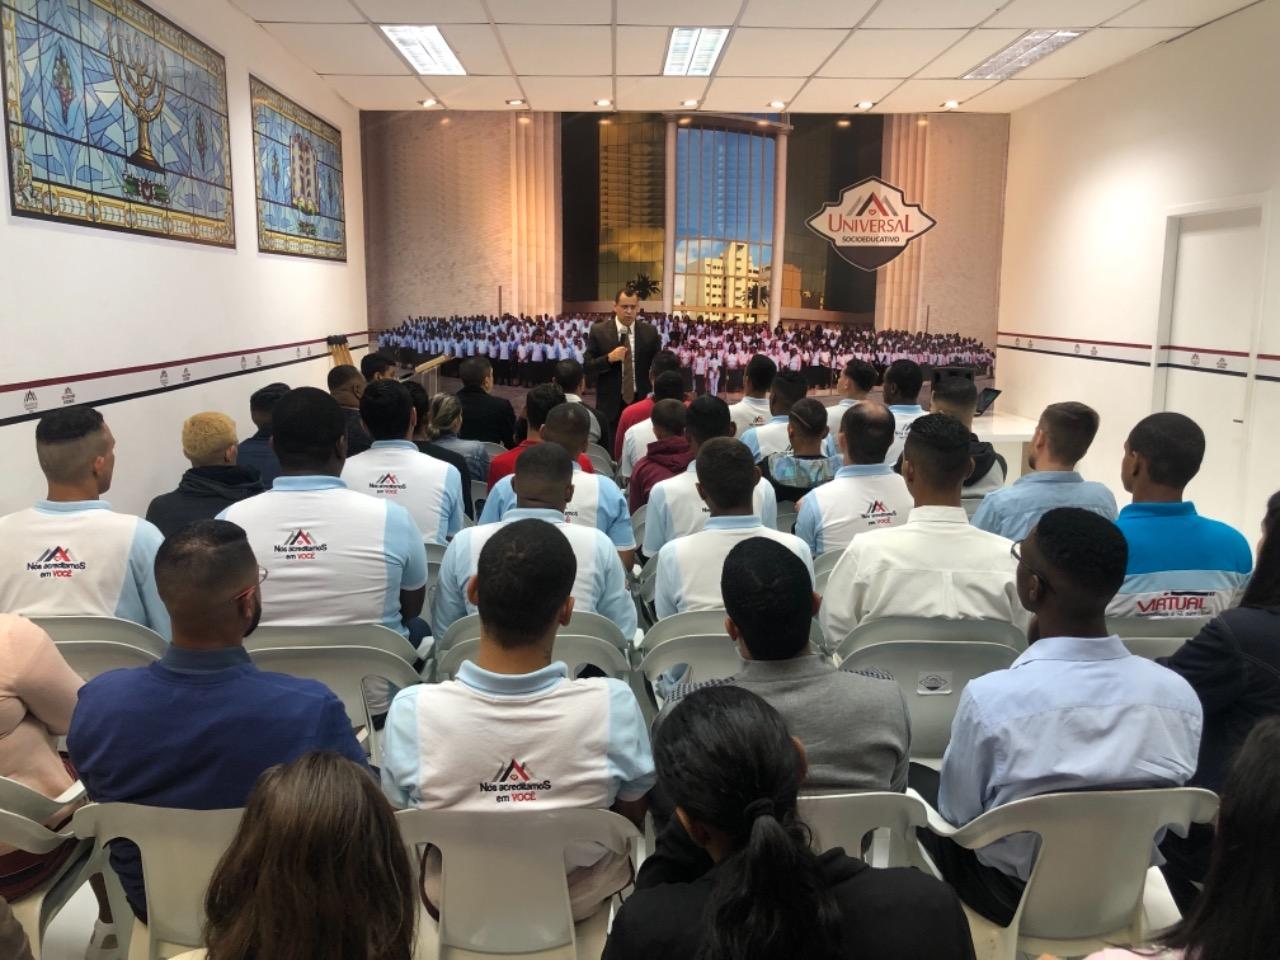 Ensinar a fé transformadora aos jovens que cumprem medidas socioeducativas